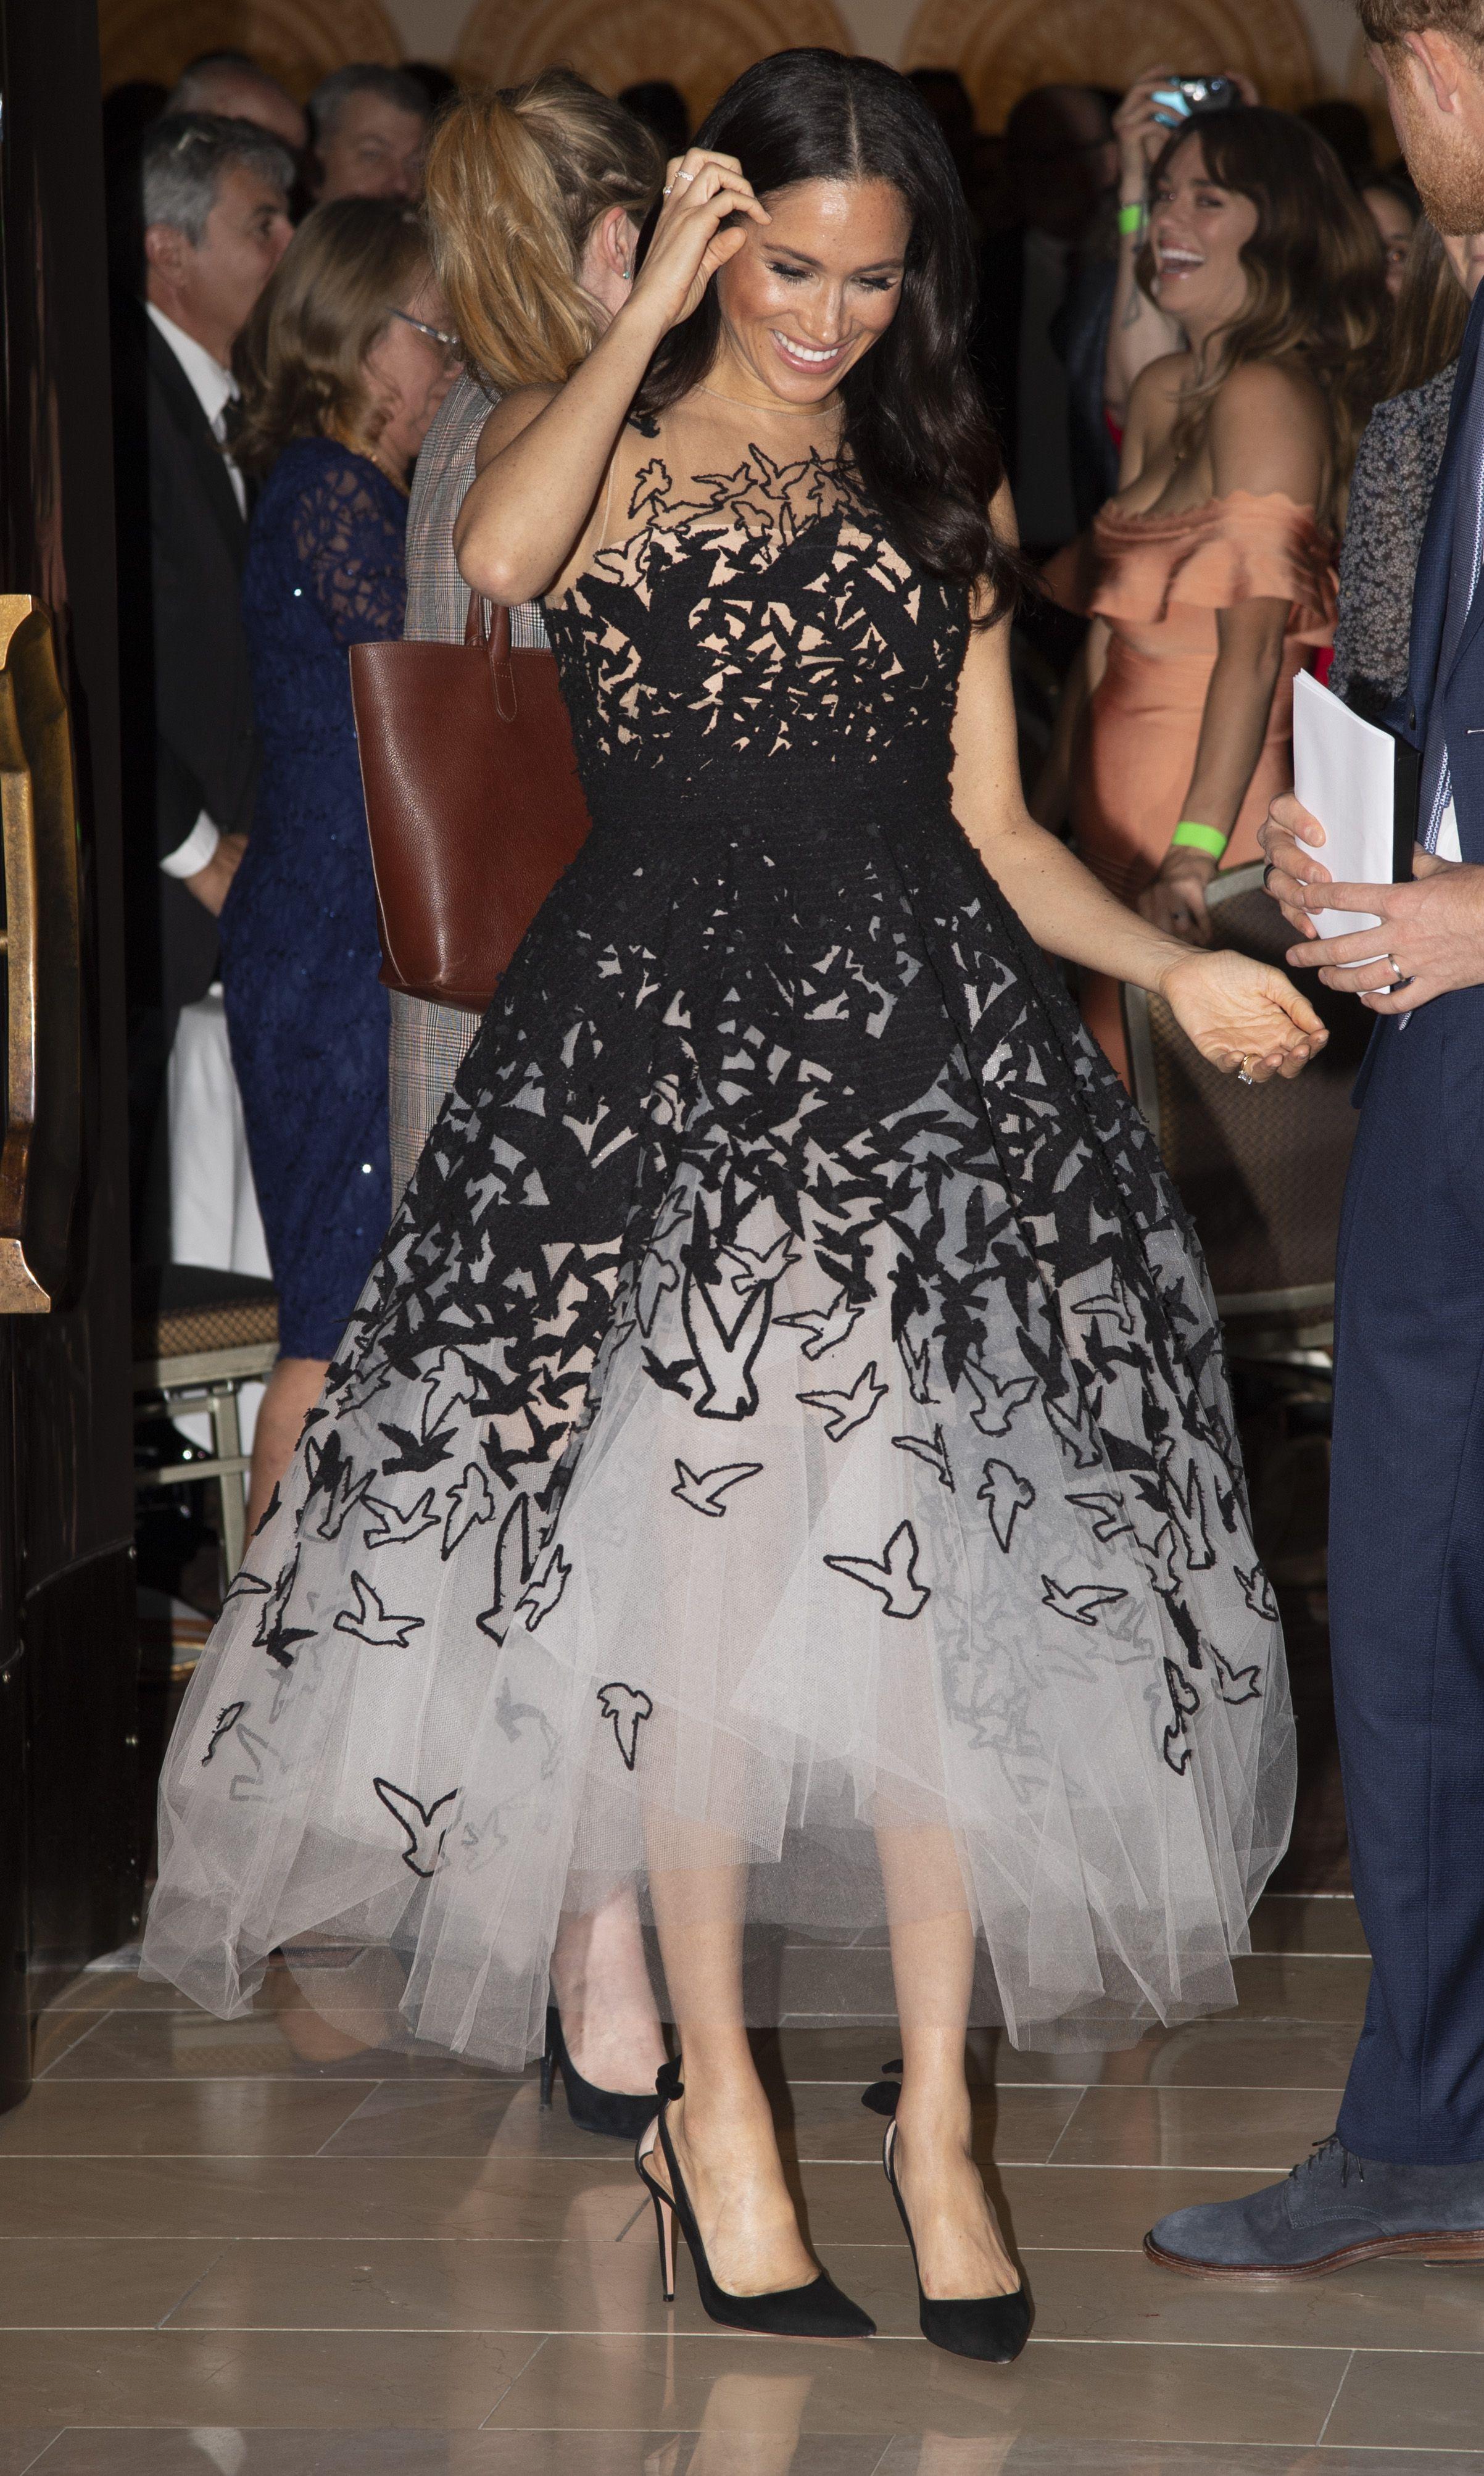 e872630d4687 Meghan Markle Steps Out in Sydney Wearing a Graphic Oscar de La Renta Gown